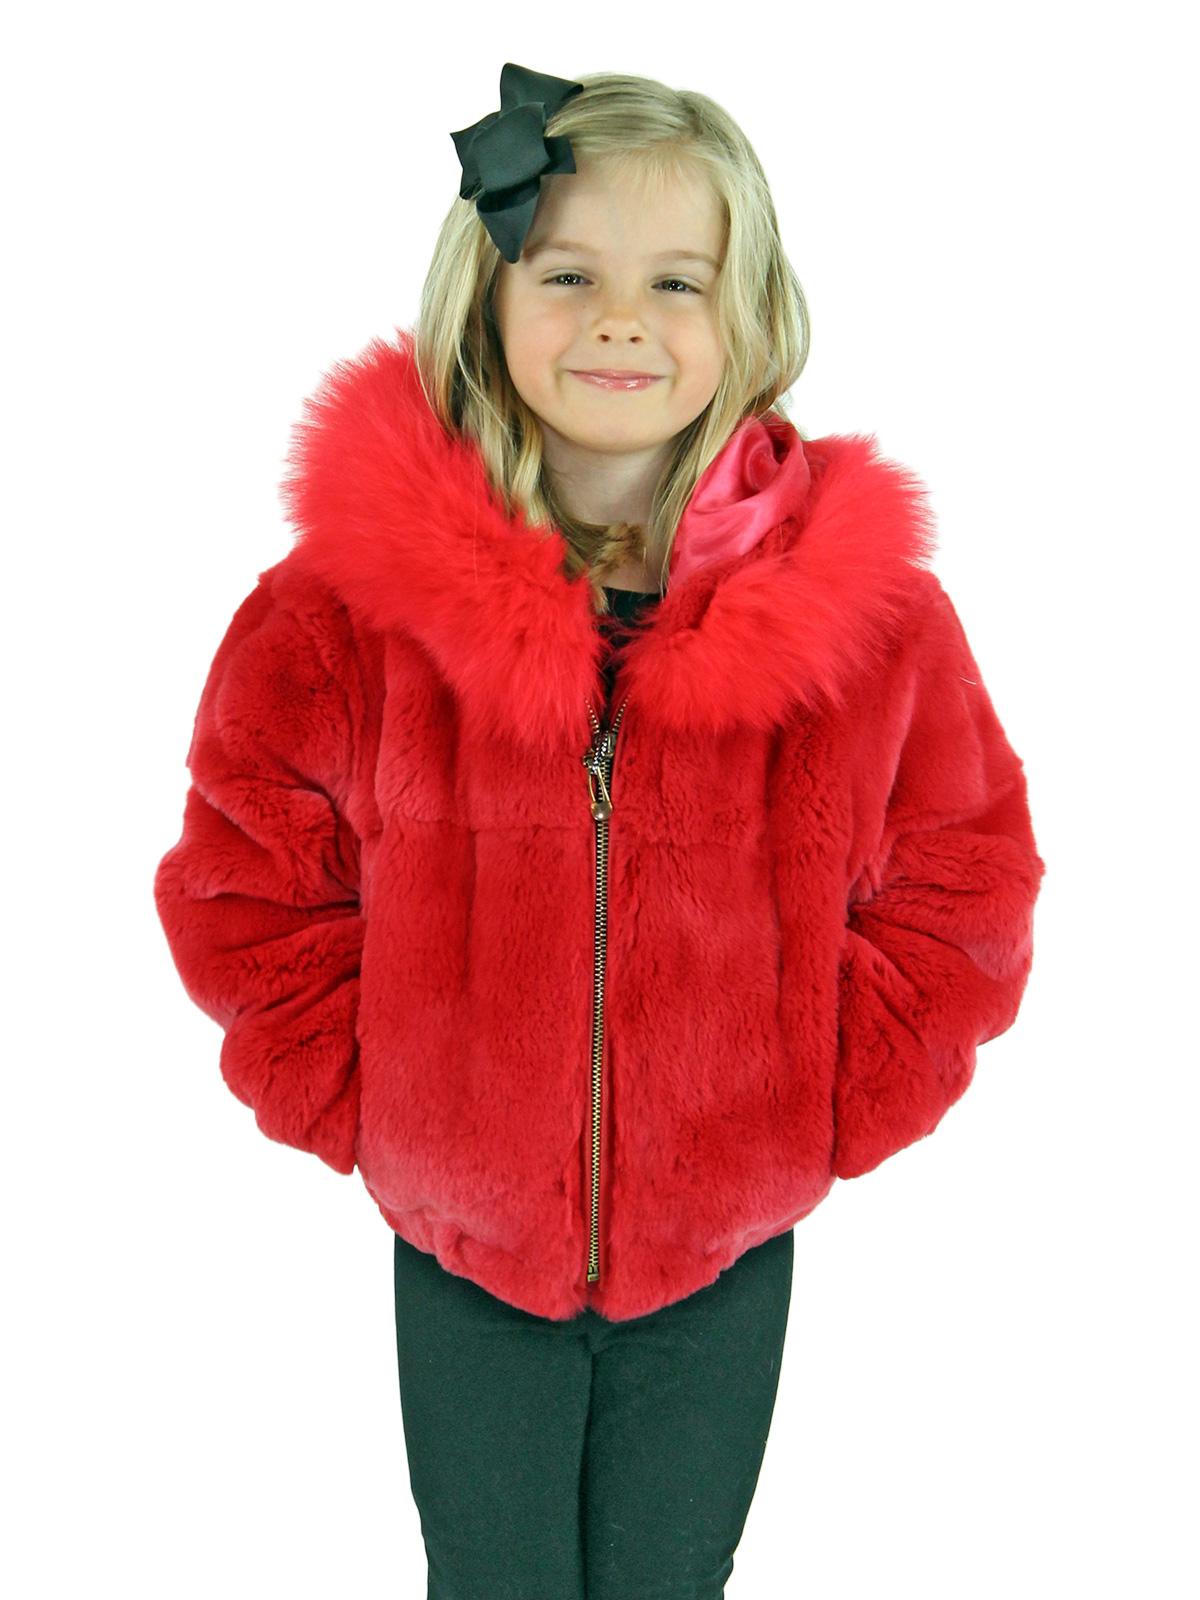 Kid's Coral Rex Rabbit Fur Jacket with Hood